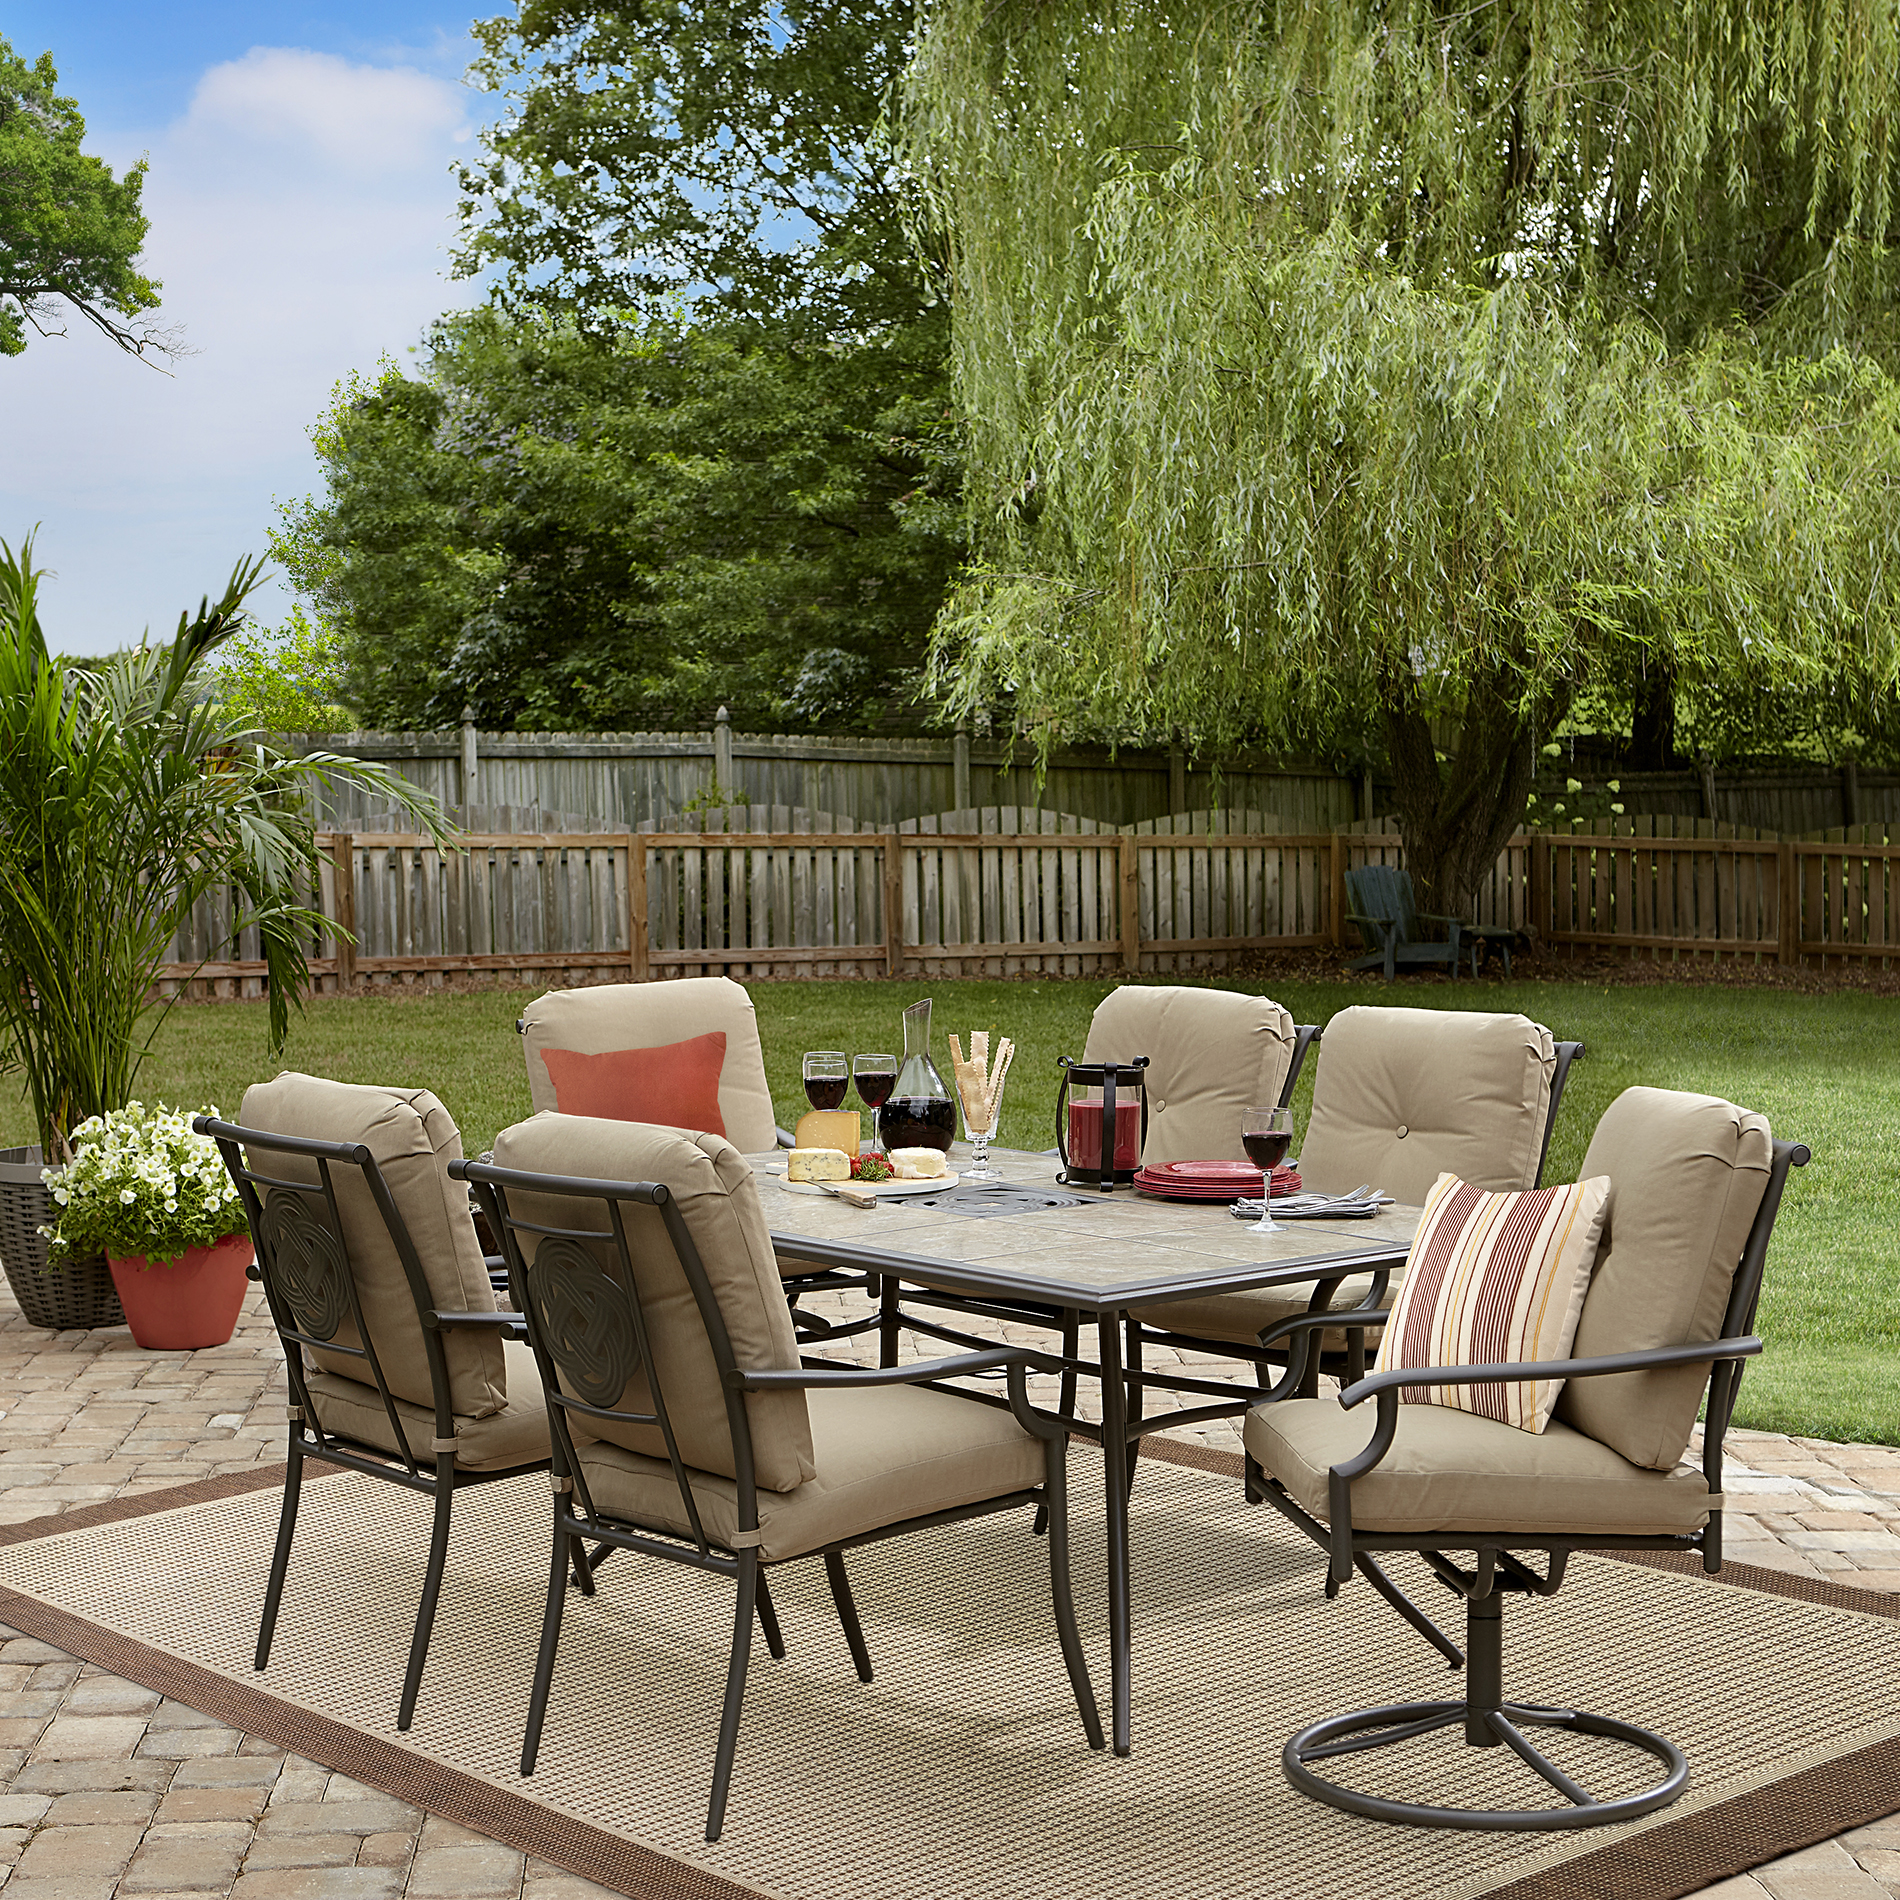 patio dining set garden oasis brookston 7-piece dining set - stone DSRLTYK